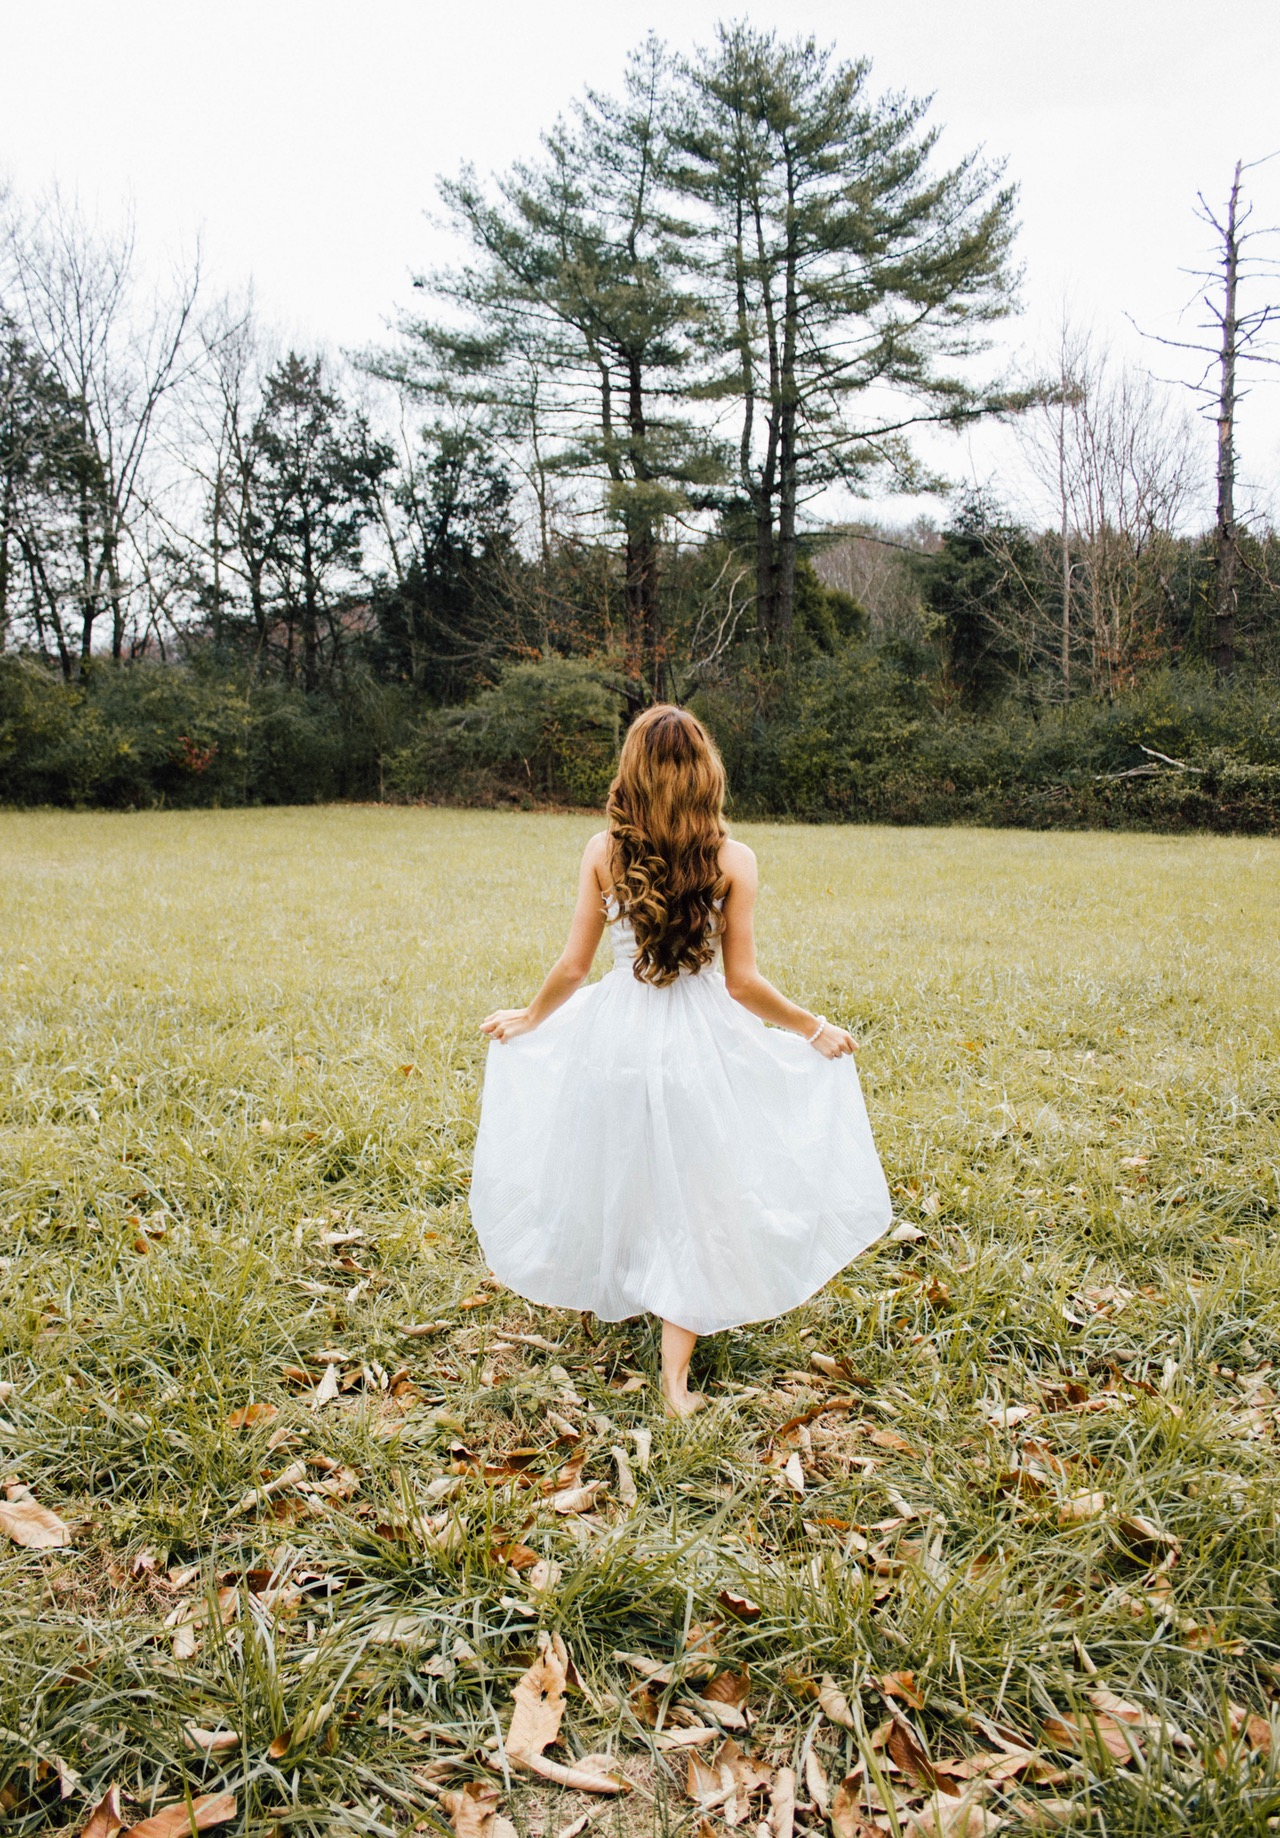 modne fryzury na wesele